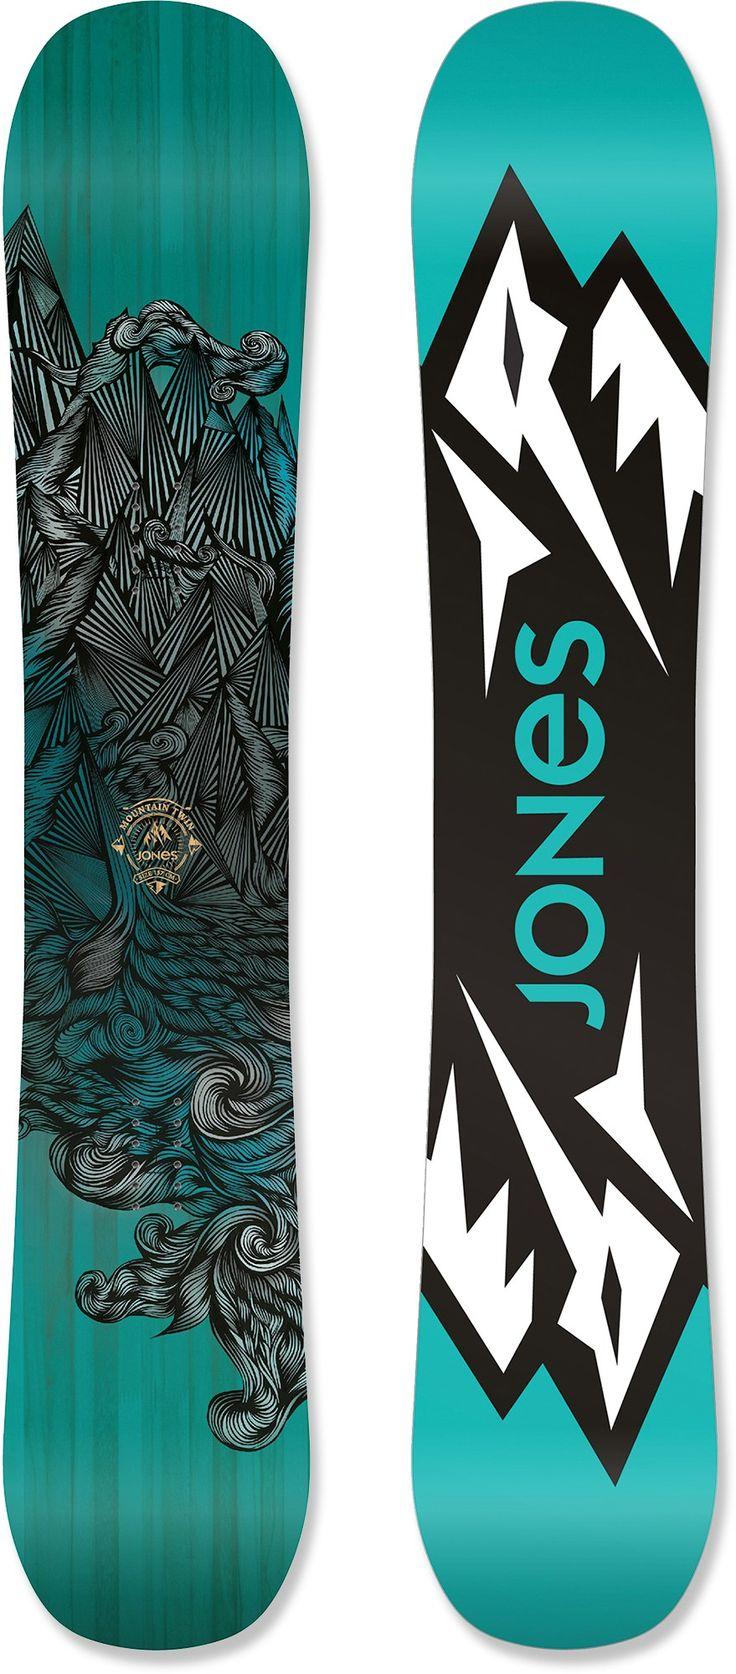 Jones Mountain Twin Snowboard - 2014/2015